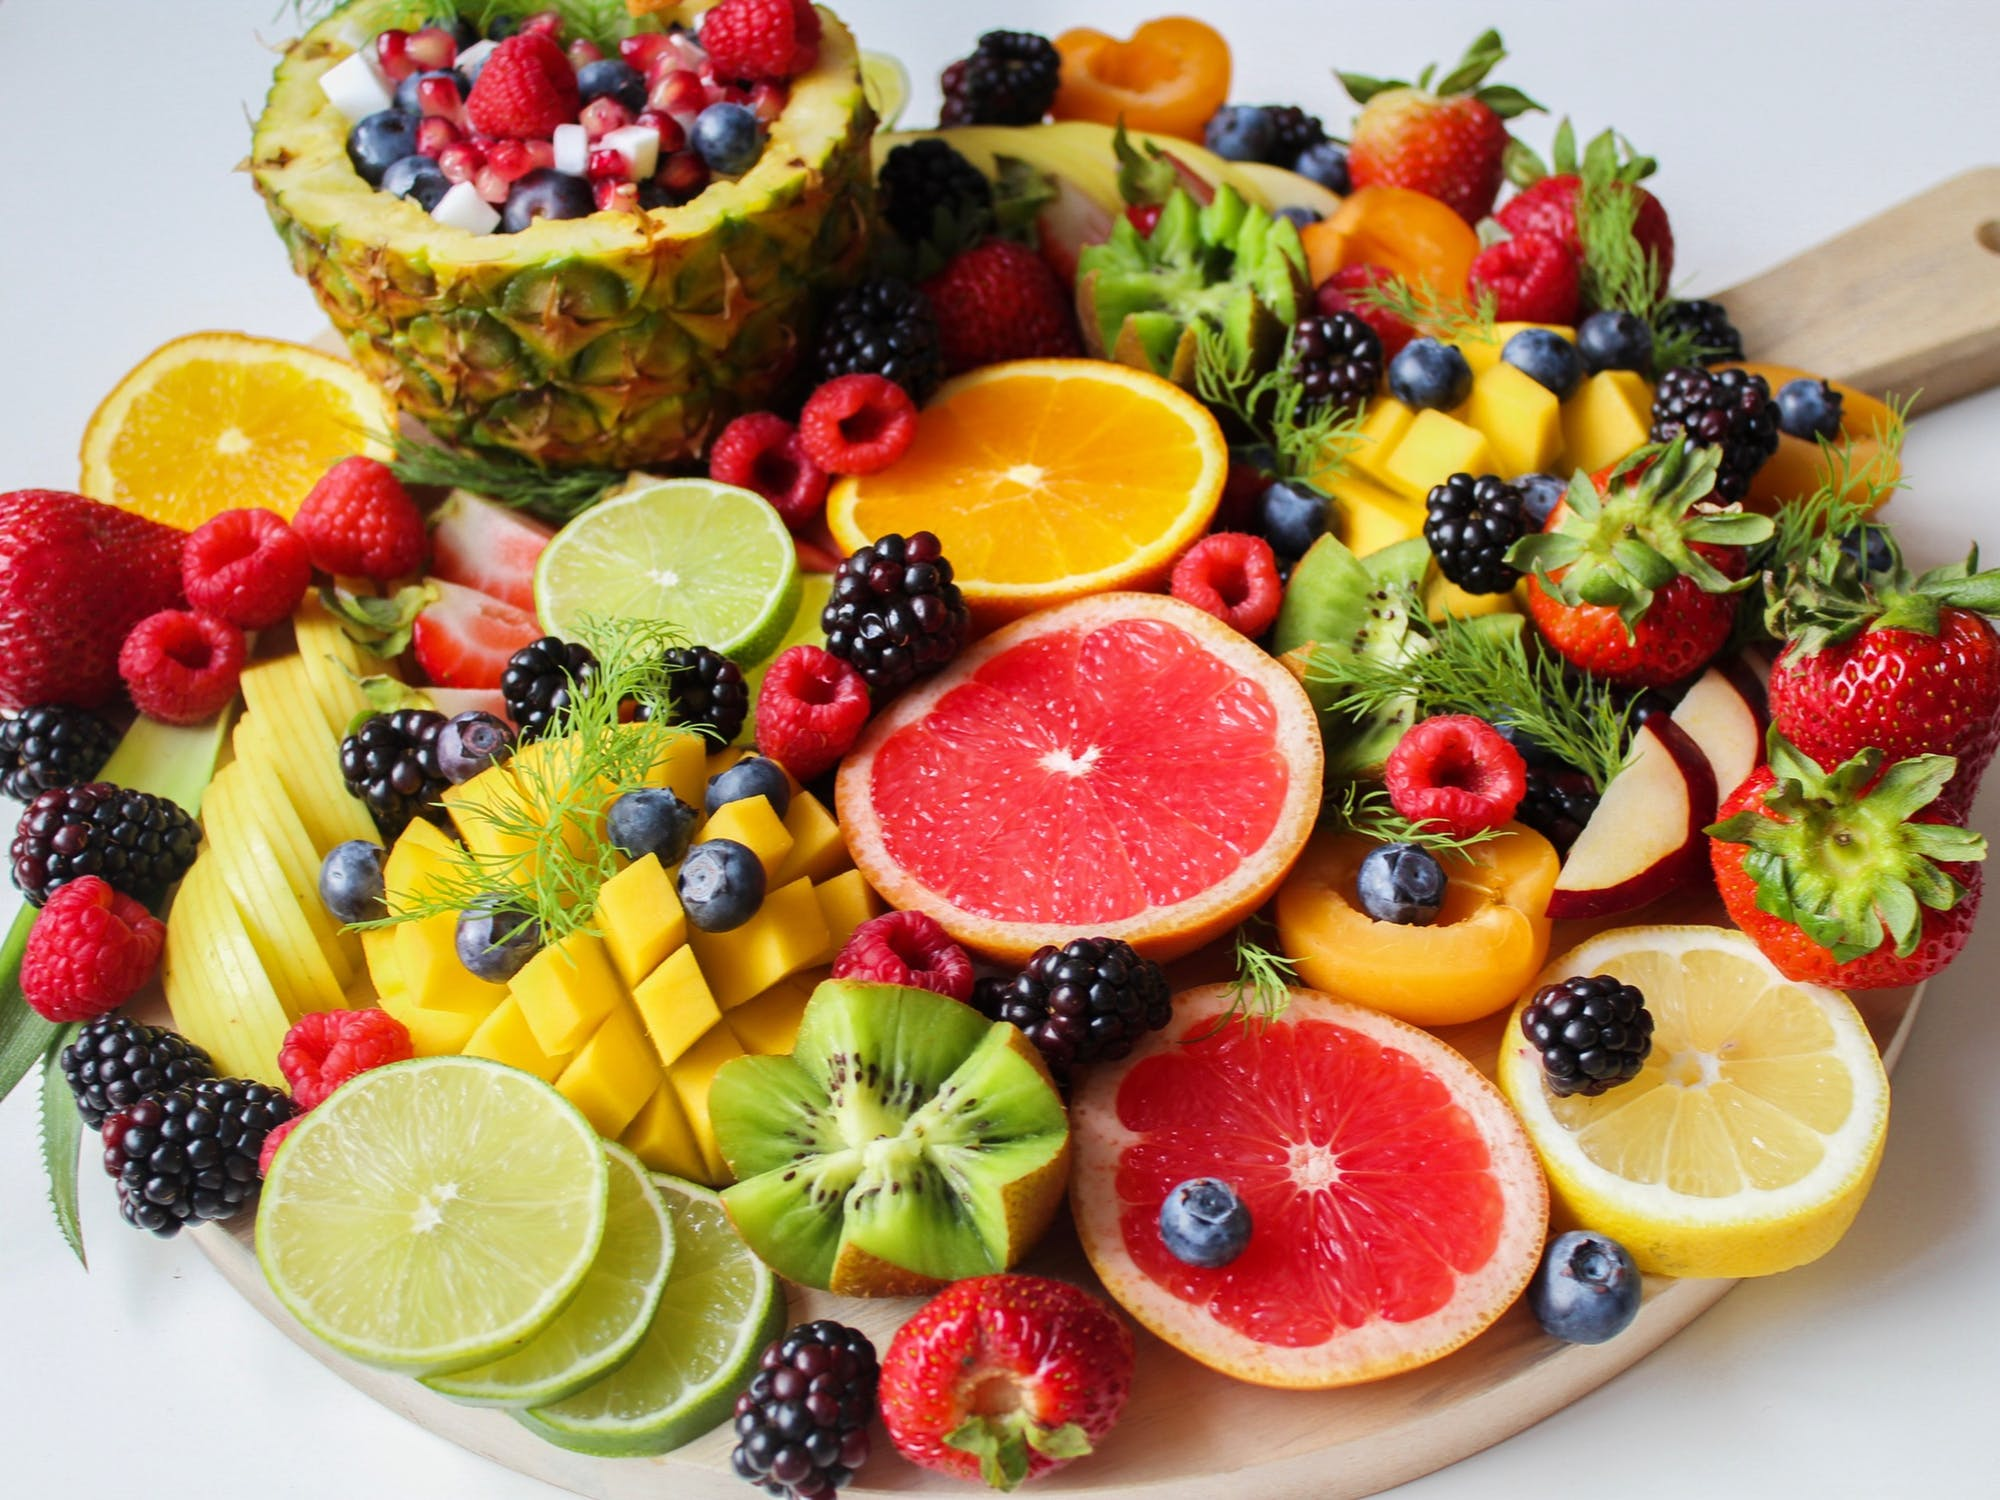 Cele mai bune alimente care contin vitamina E